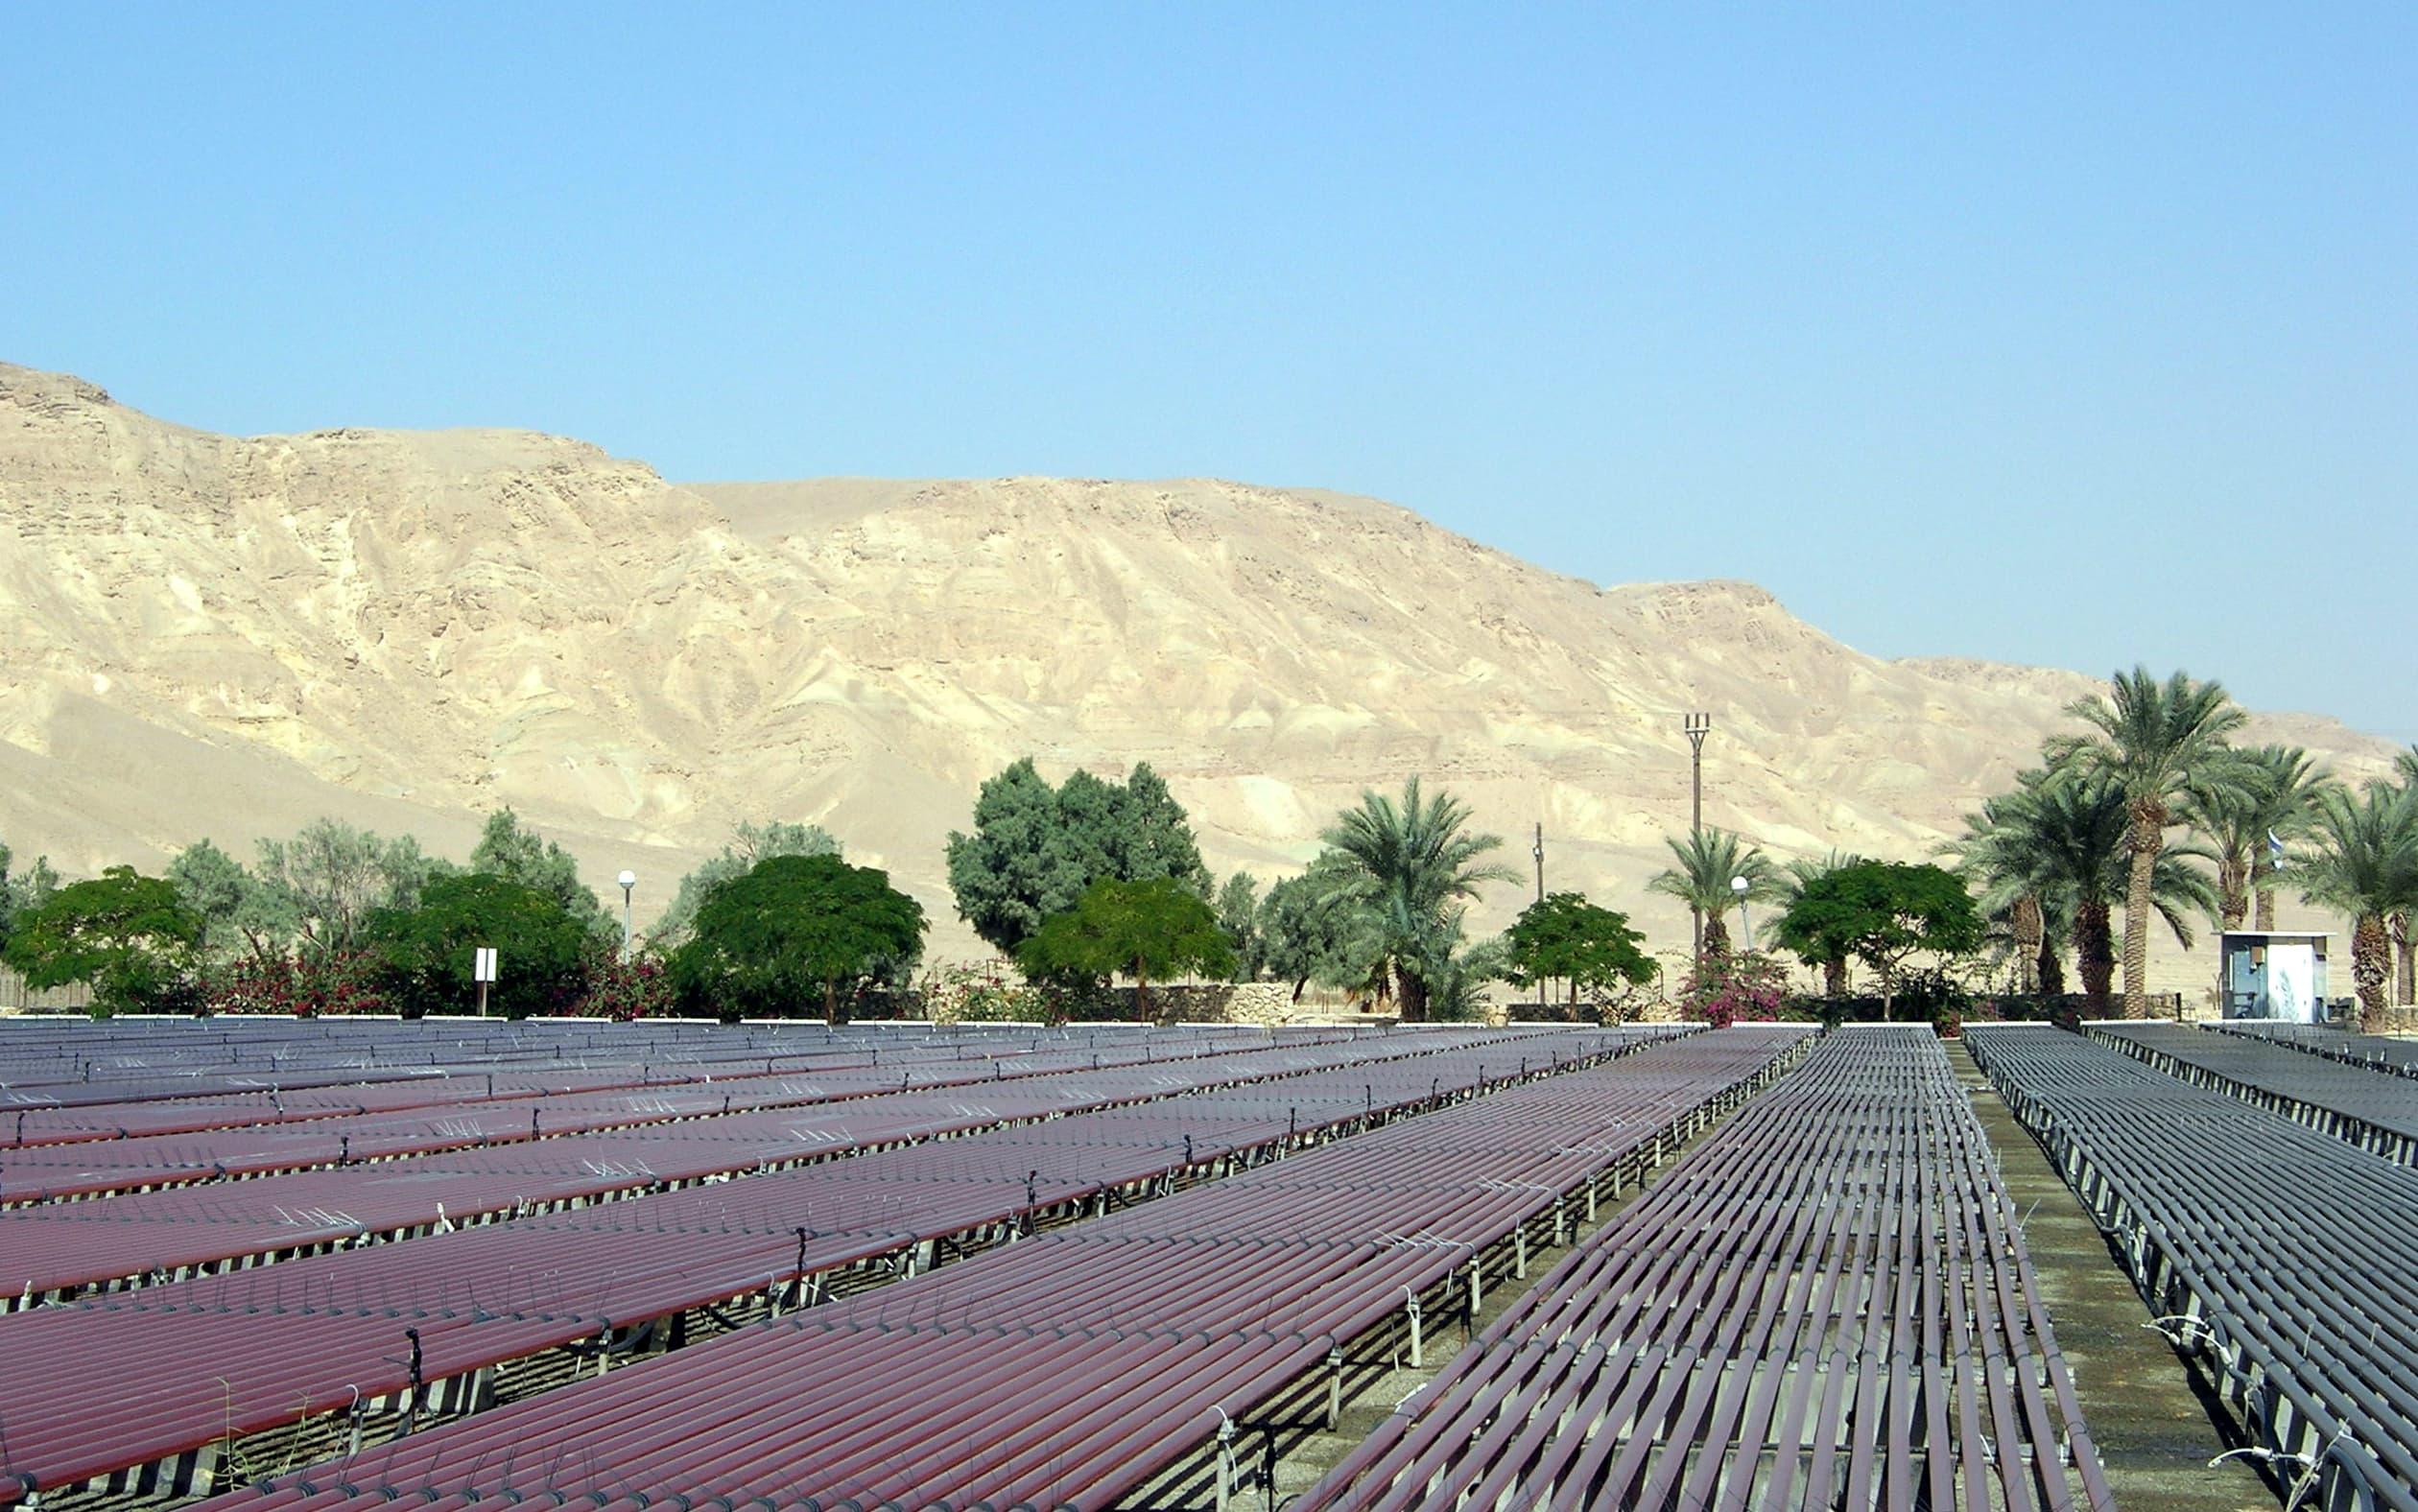 Aquaculture in Kibbutz in the Negev Desert